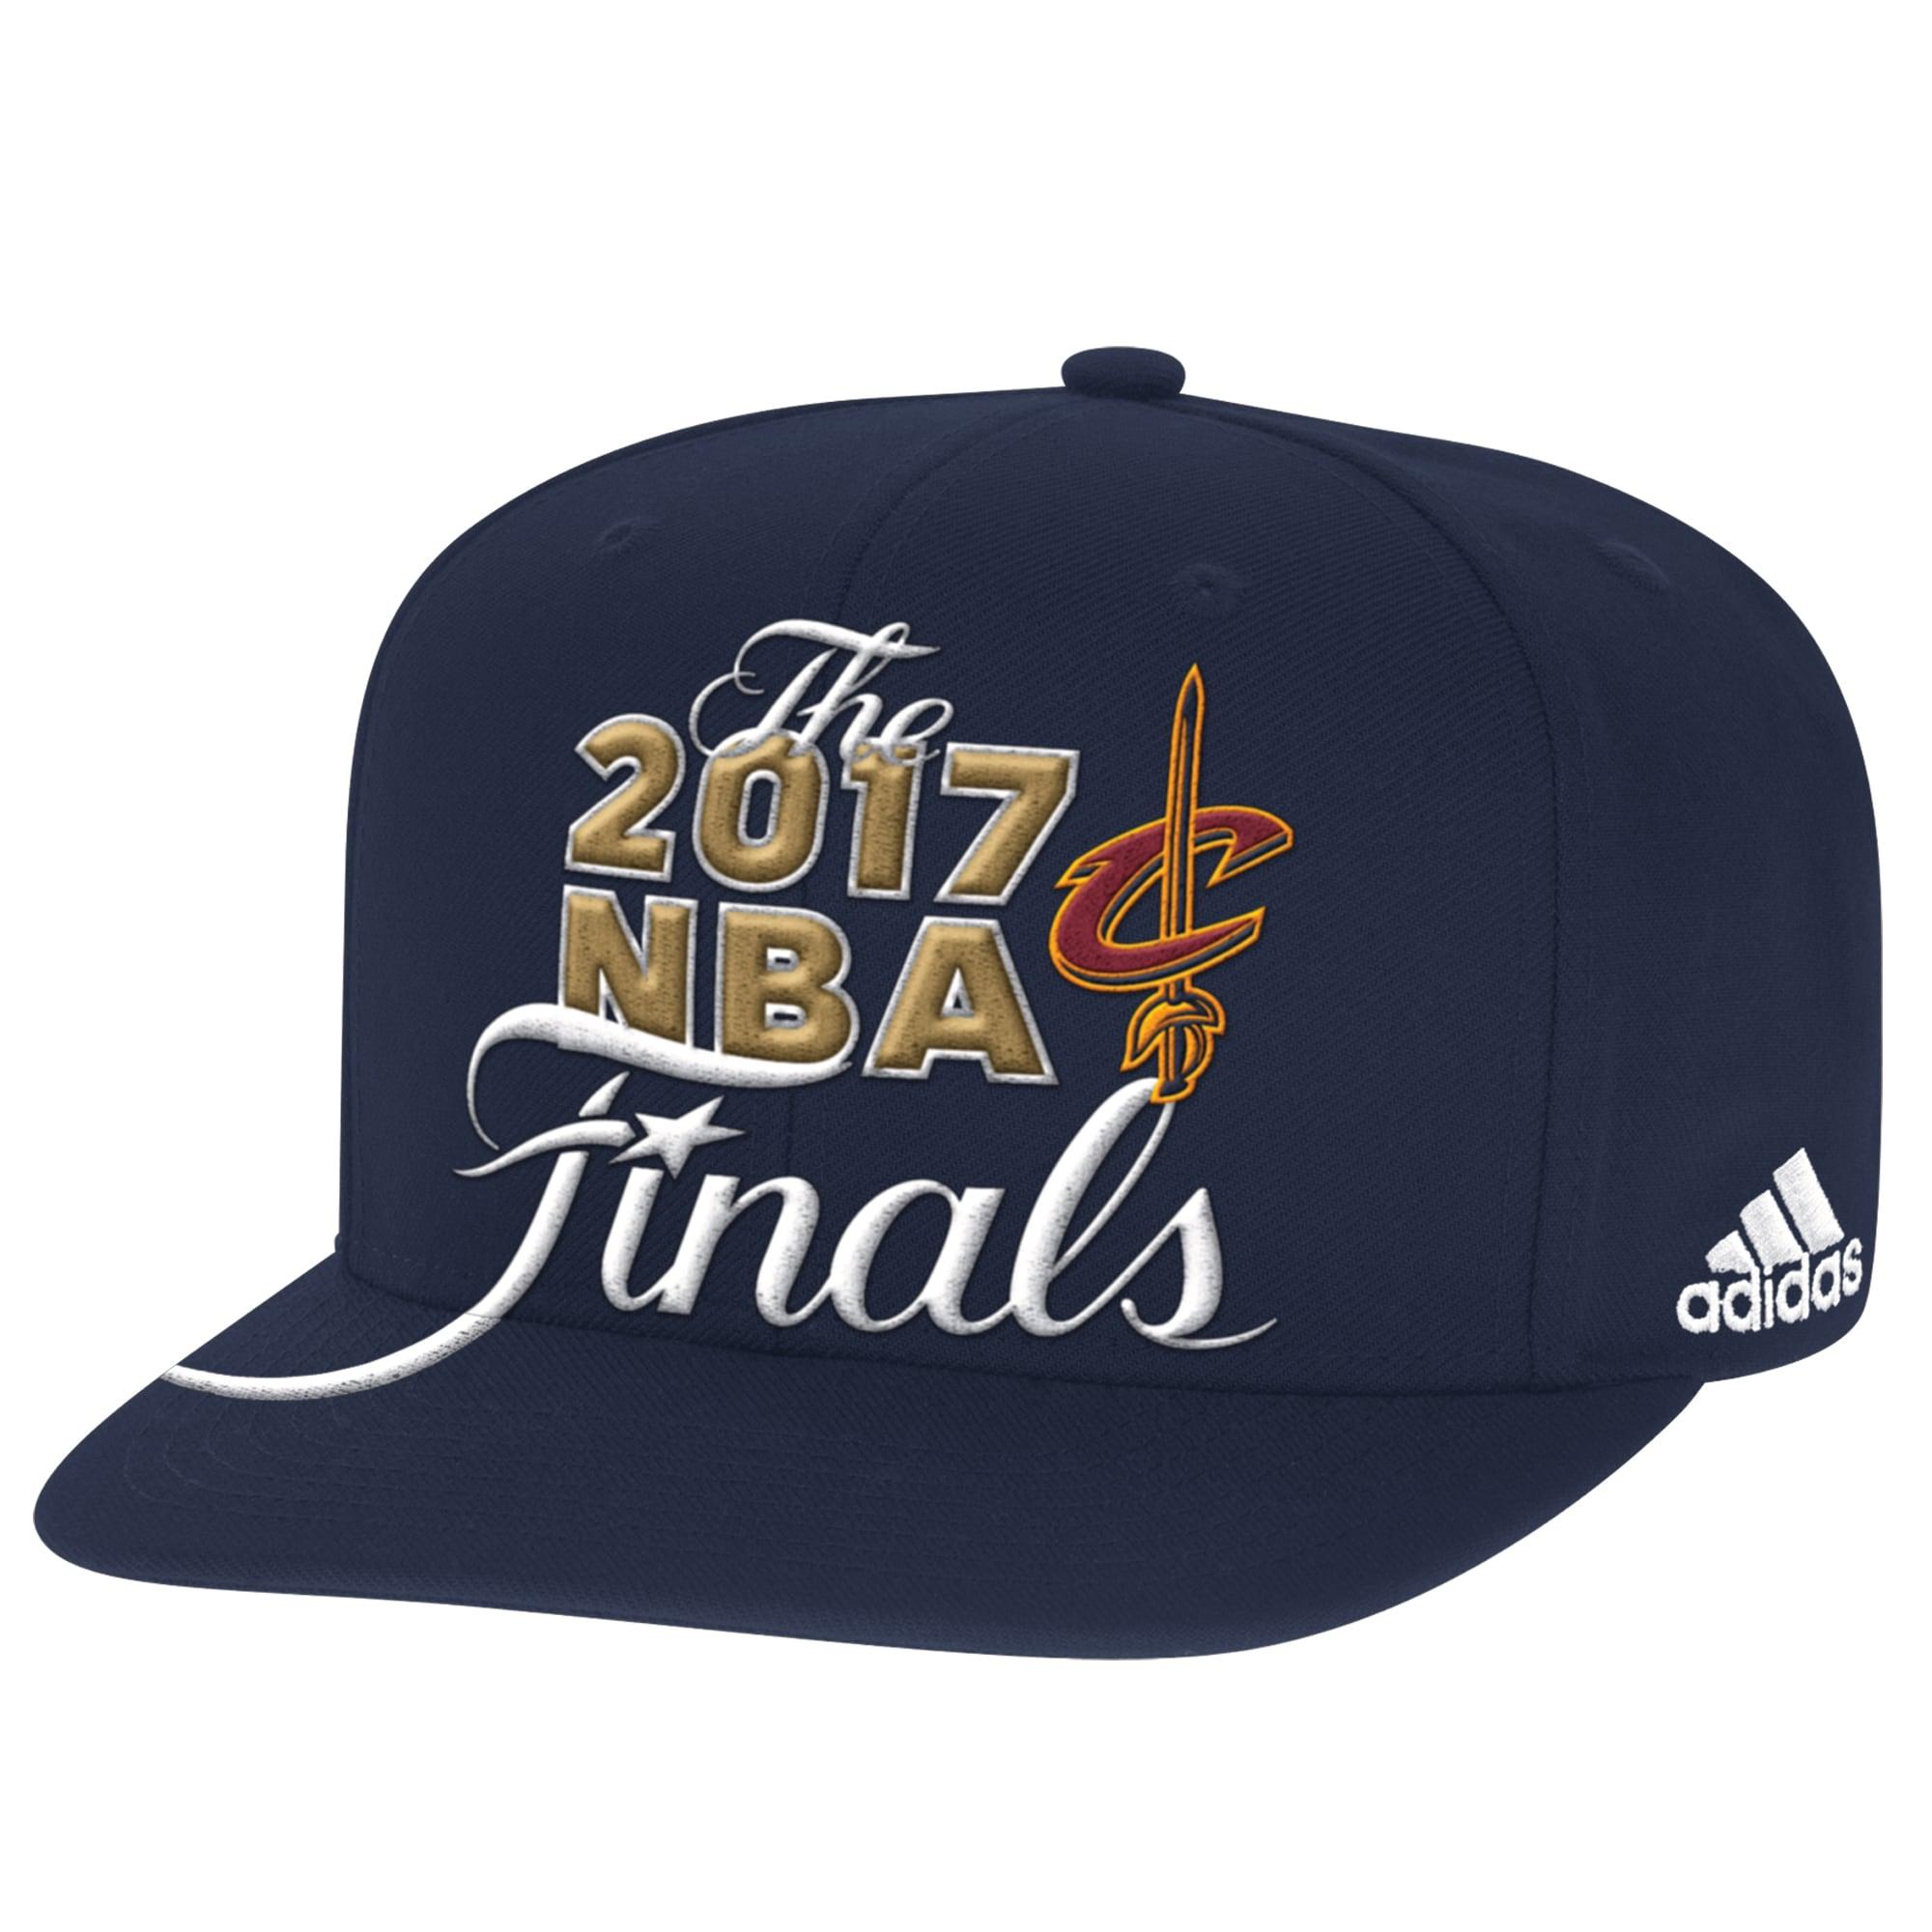 Cleveland Cavaliers adidas 2017 Eastern Conference Champions Locker Room Snapback Adjustable Hat - Navy